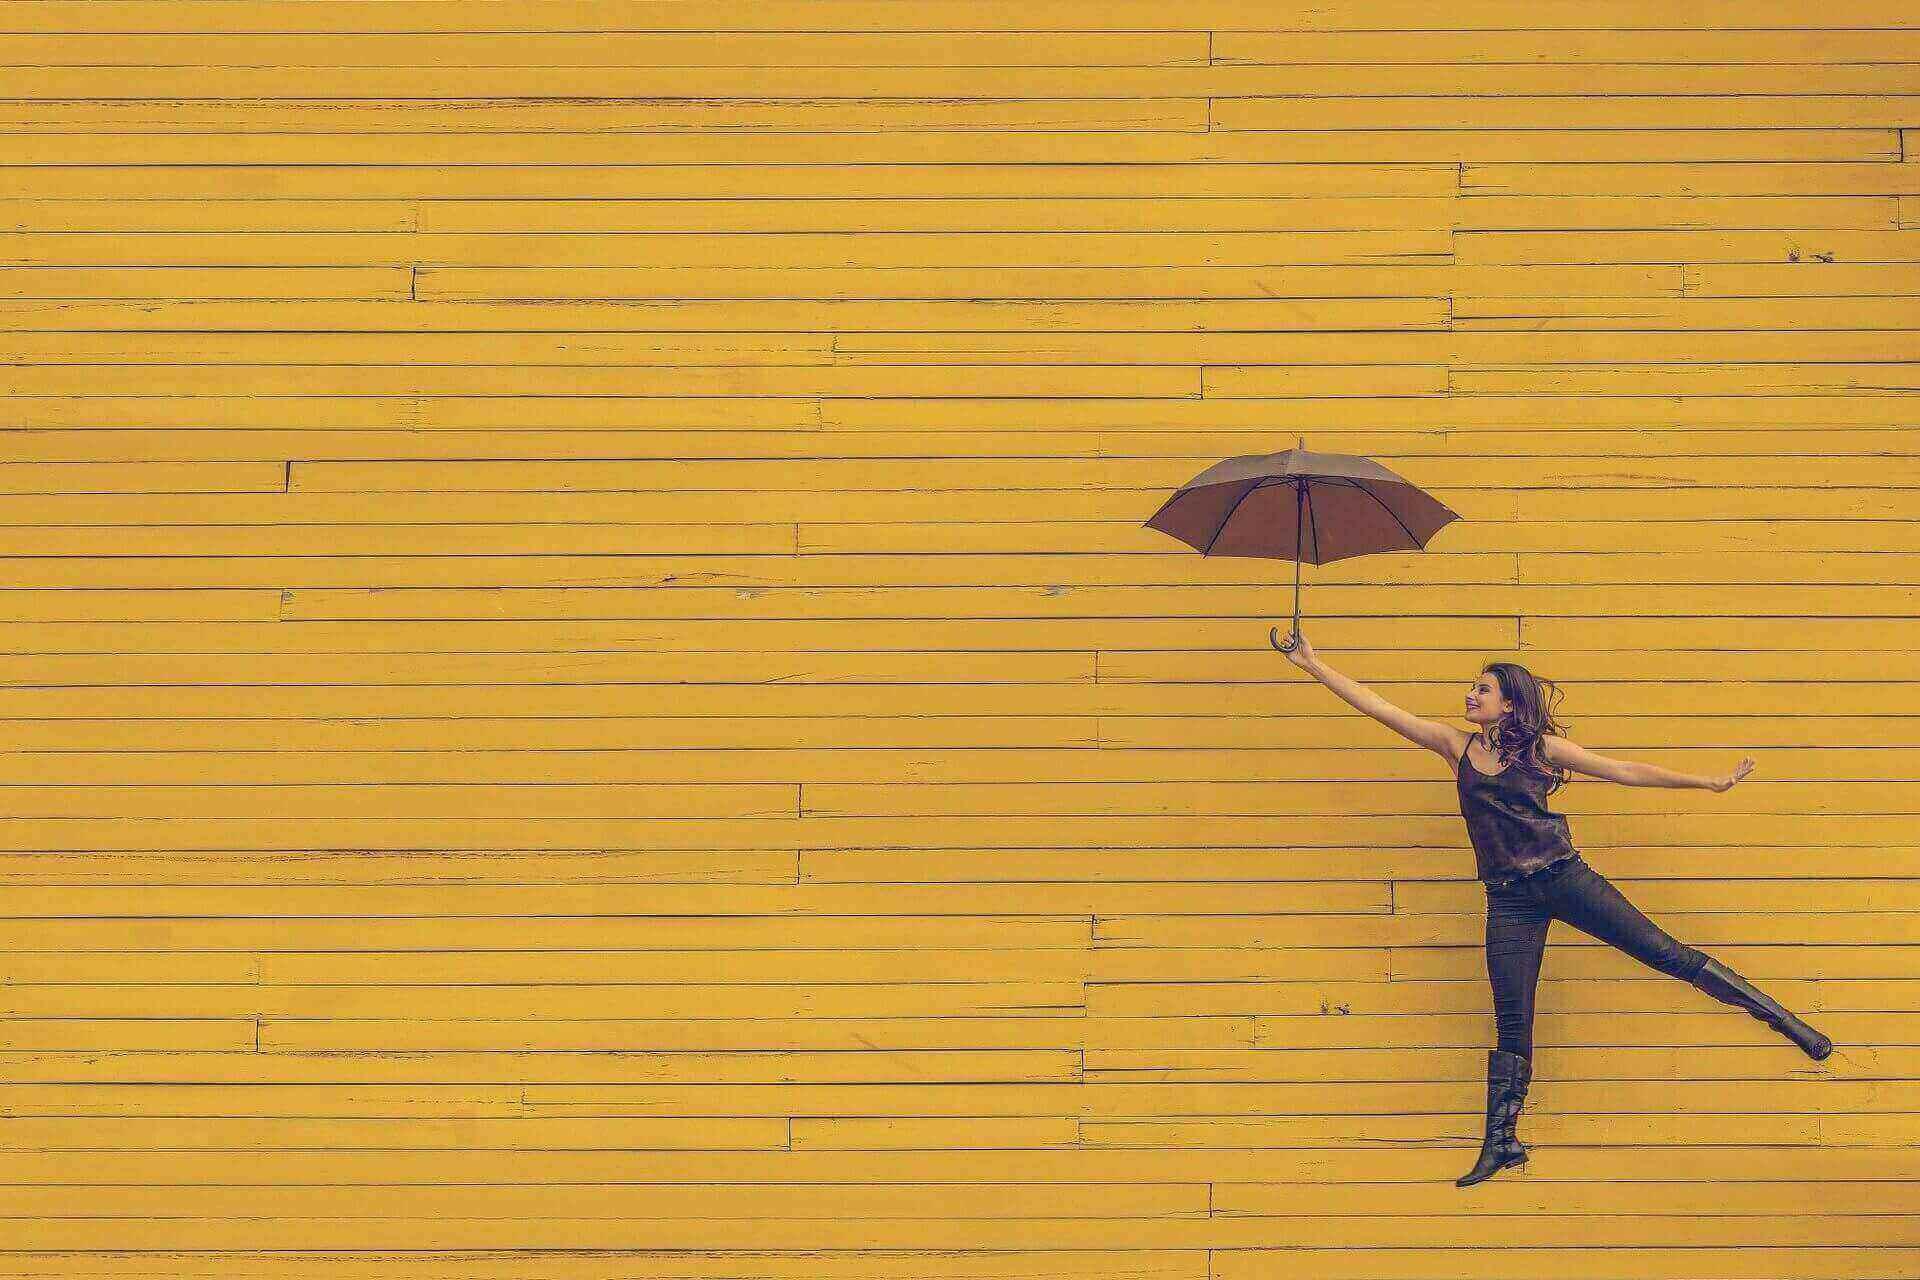 Boost Your Happiness | Freelance Writer | Australia | Tasmania | Lea Farrow | Writer | Writing | Copywriter | Copywriting | Online | Website Copy | Web Copy | Feature Articles | Feature Writing | Blog Posts | Blogging | Newspaper | Magazine | Publication | Technical Writing | Reviews | Real Estate Copy | SEO